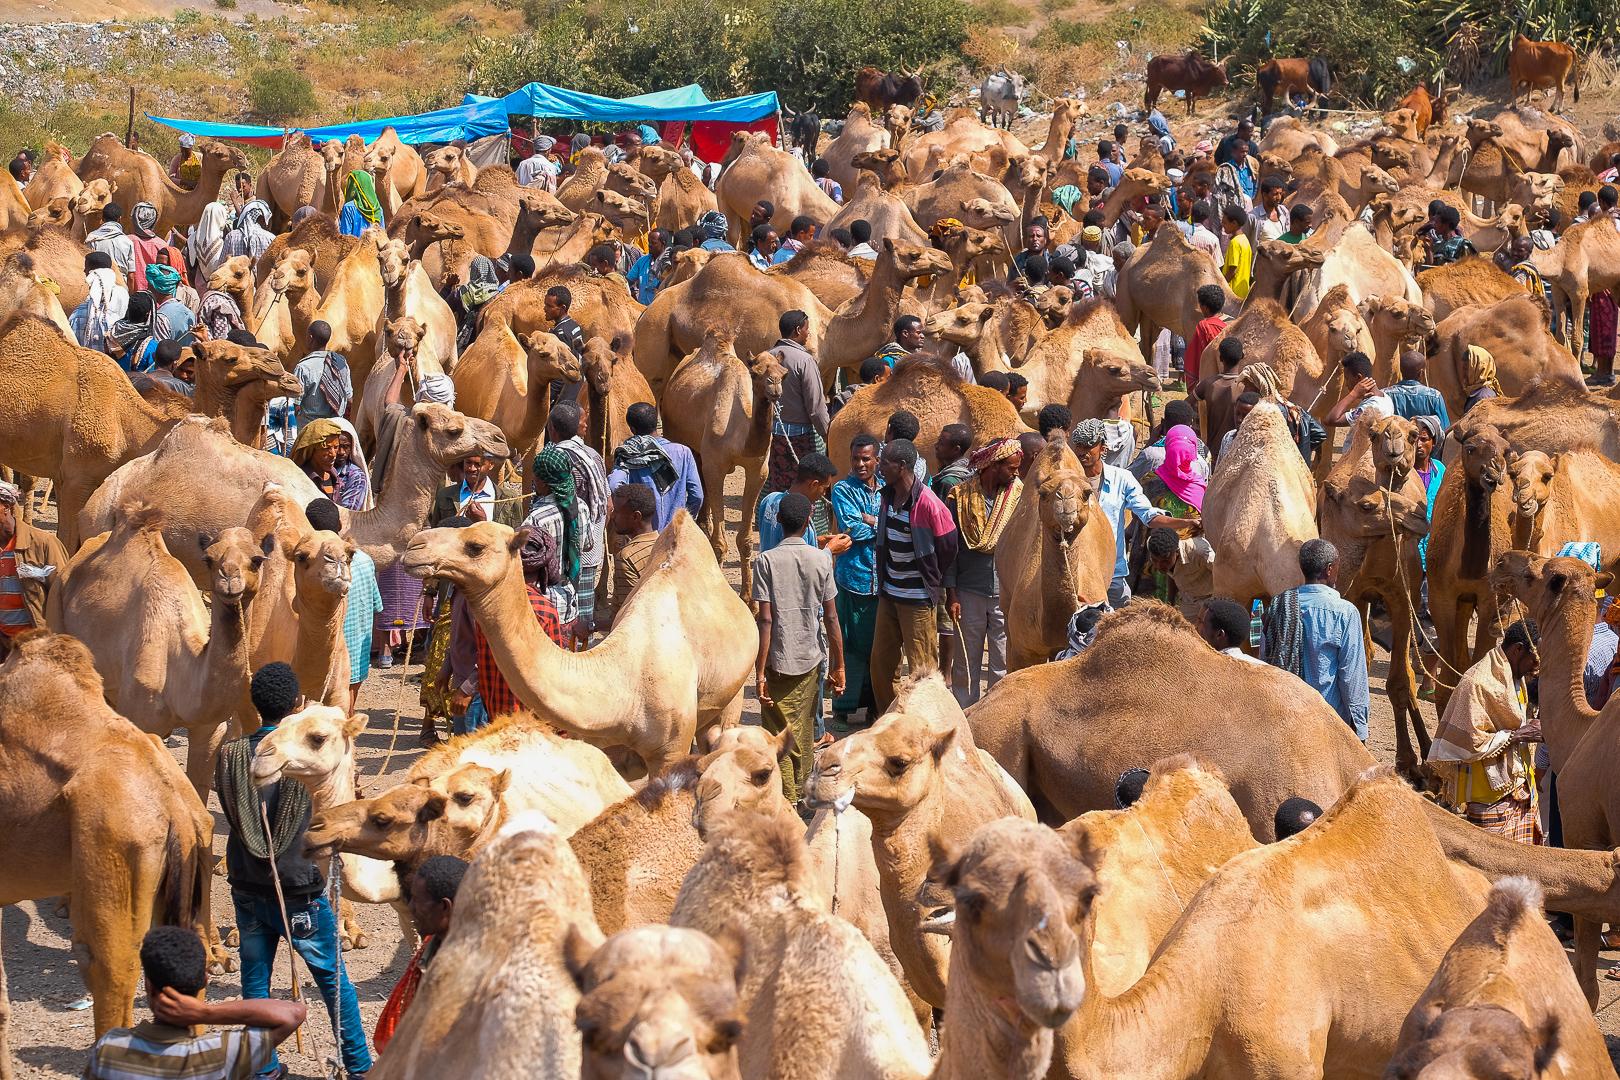 busy day at Bati market, Ethiopia